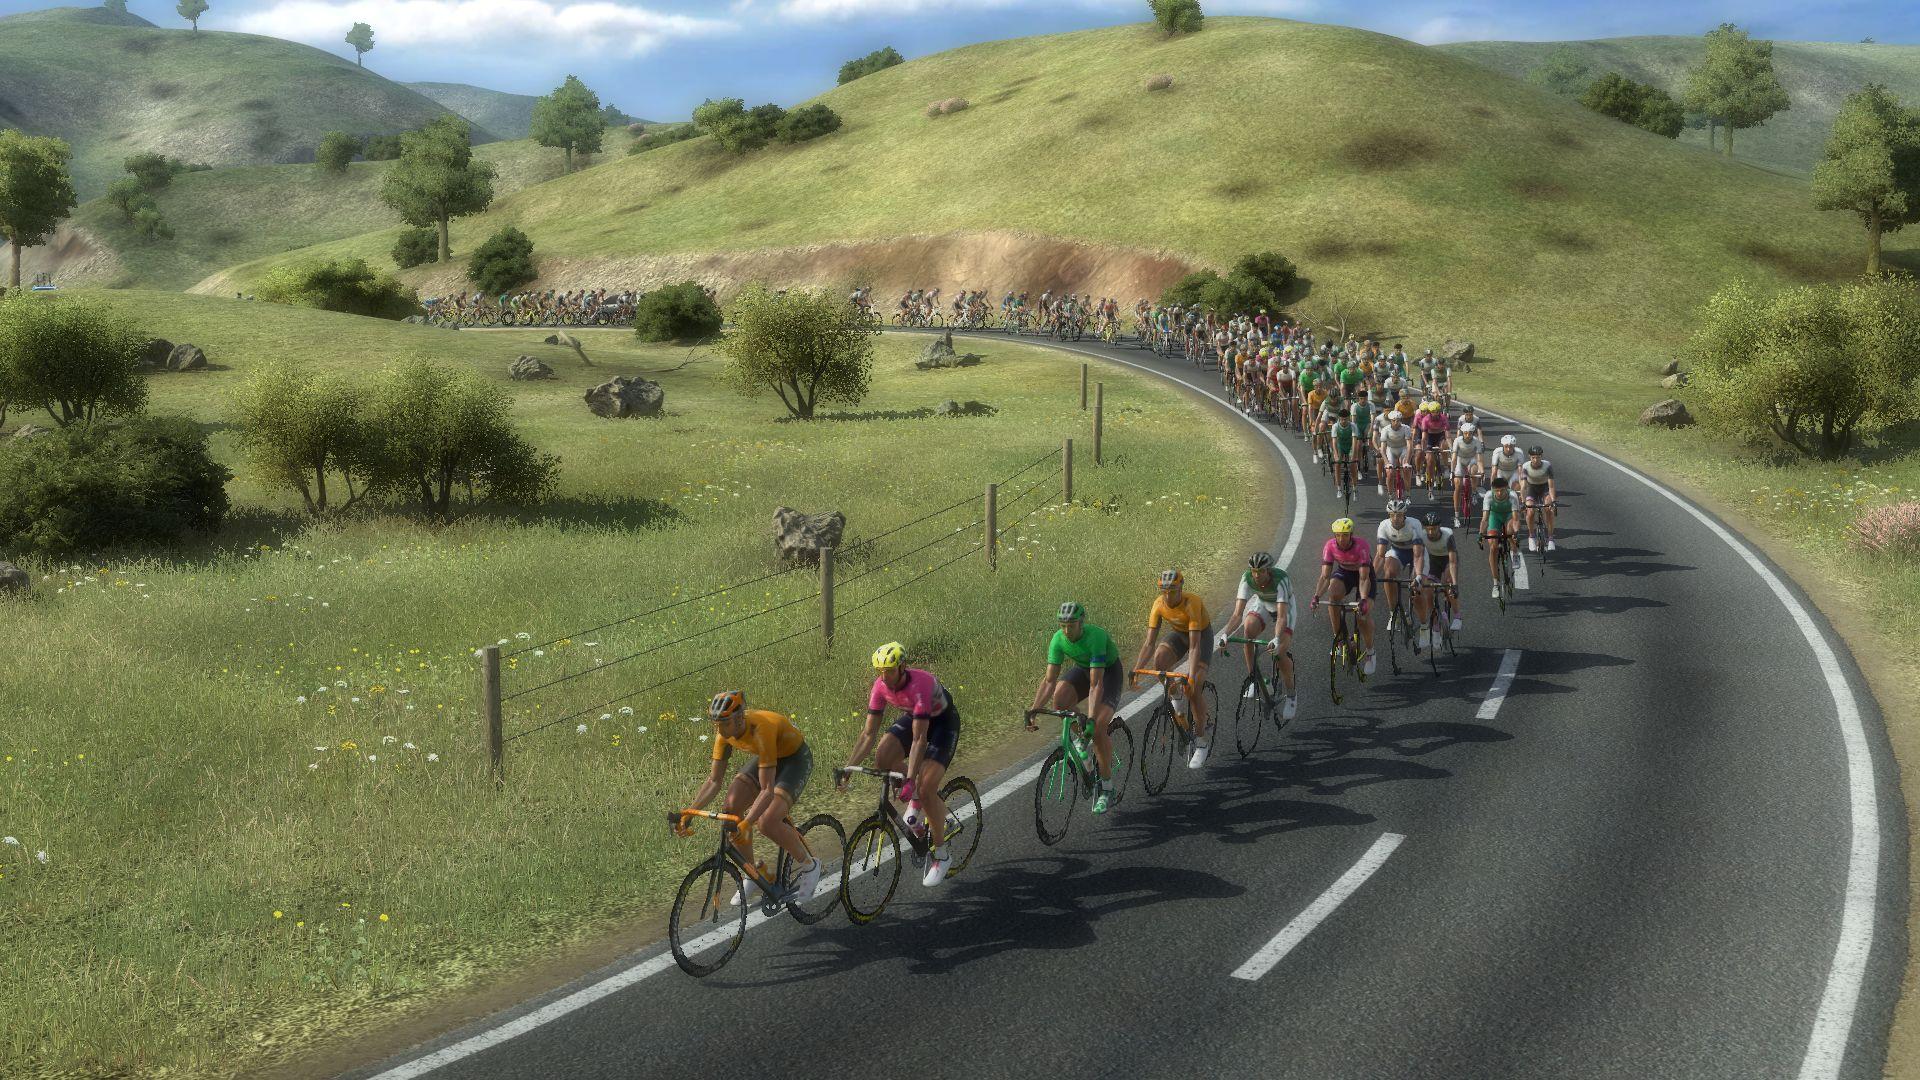 pcmdaily.com/images/mg/2019/Races/C2/Gisborne/Gisborne%202.jpg